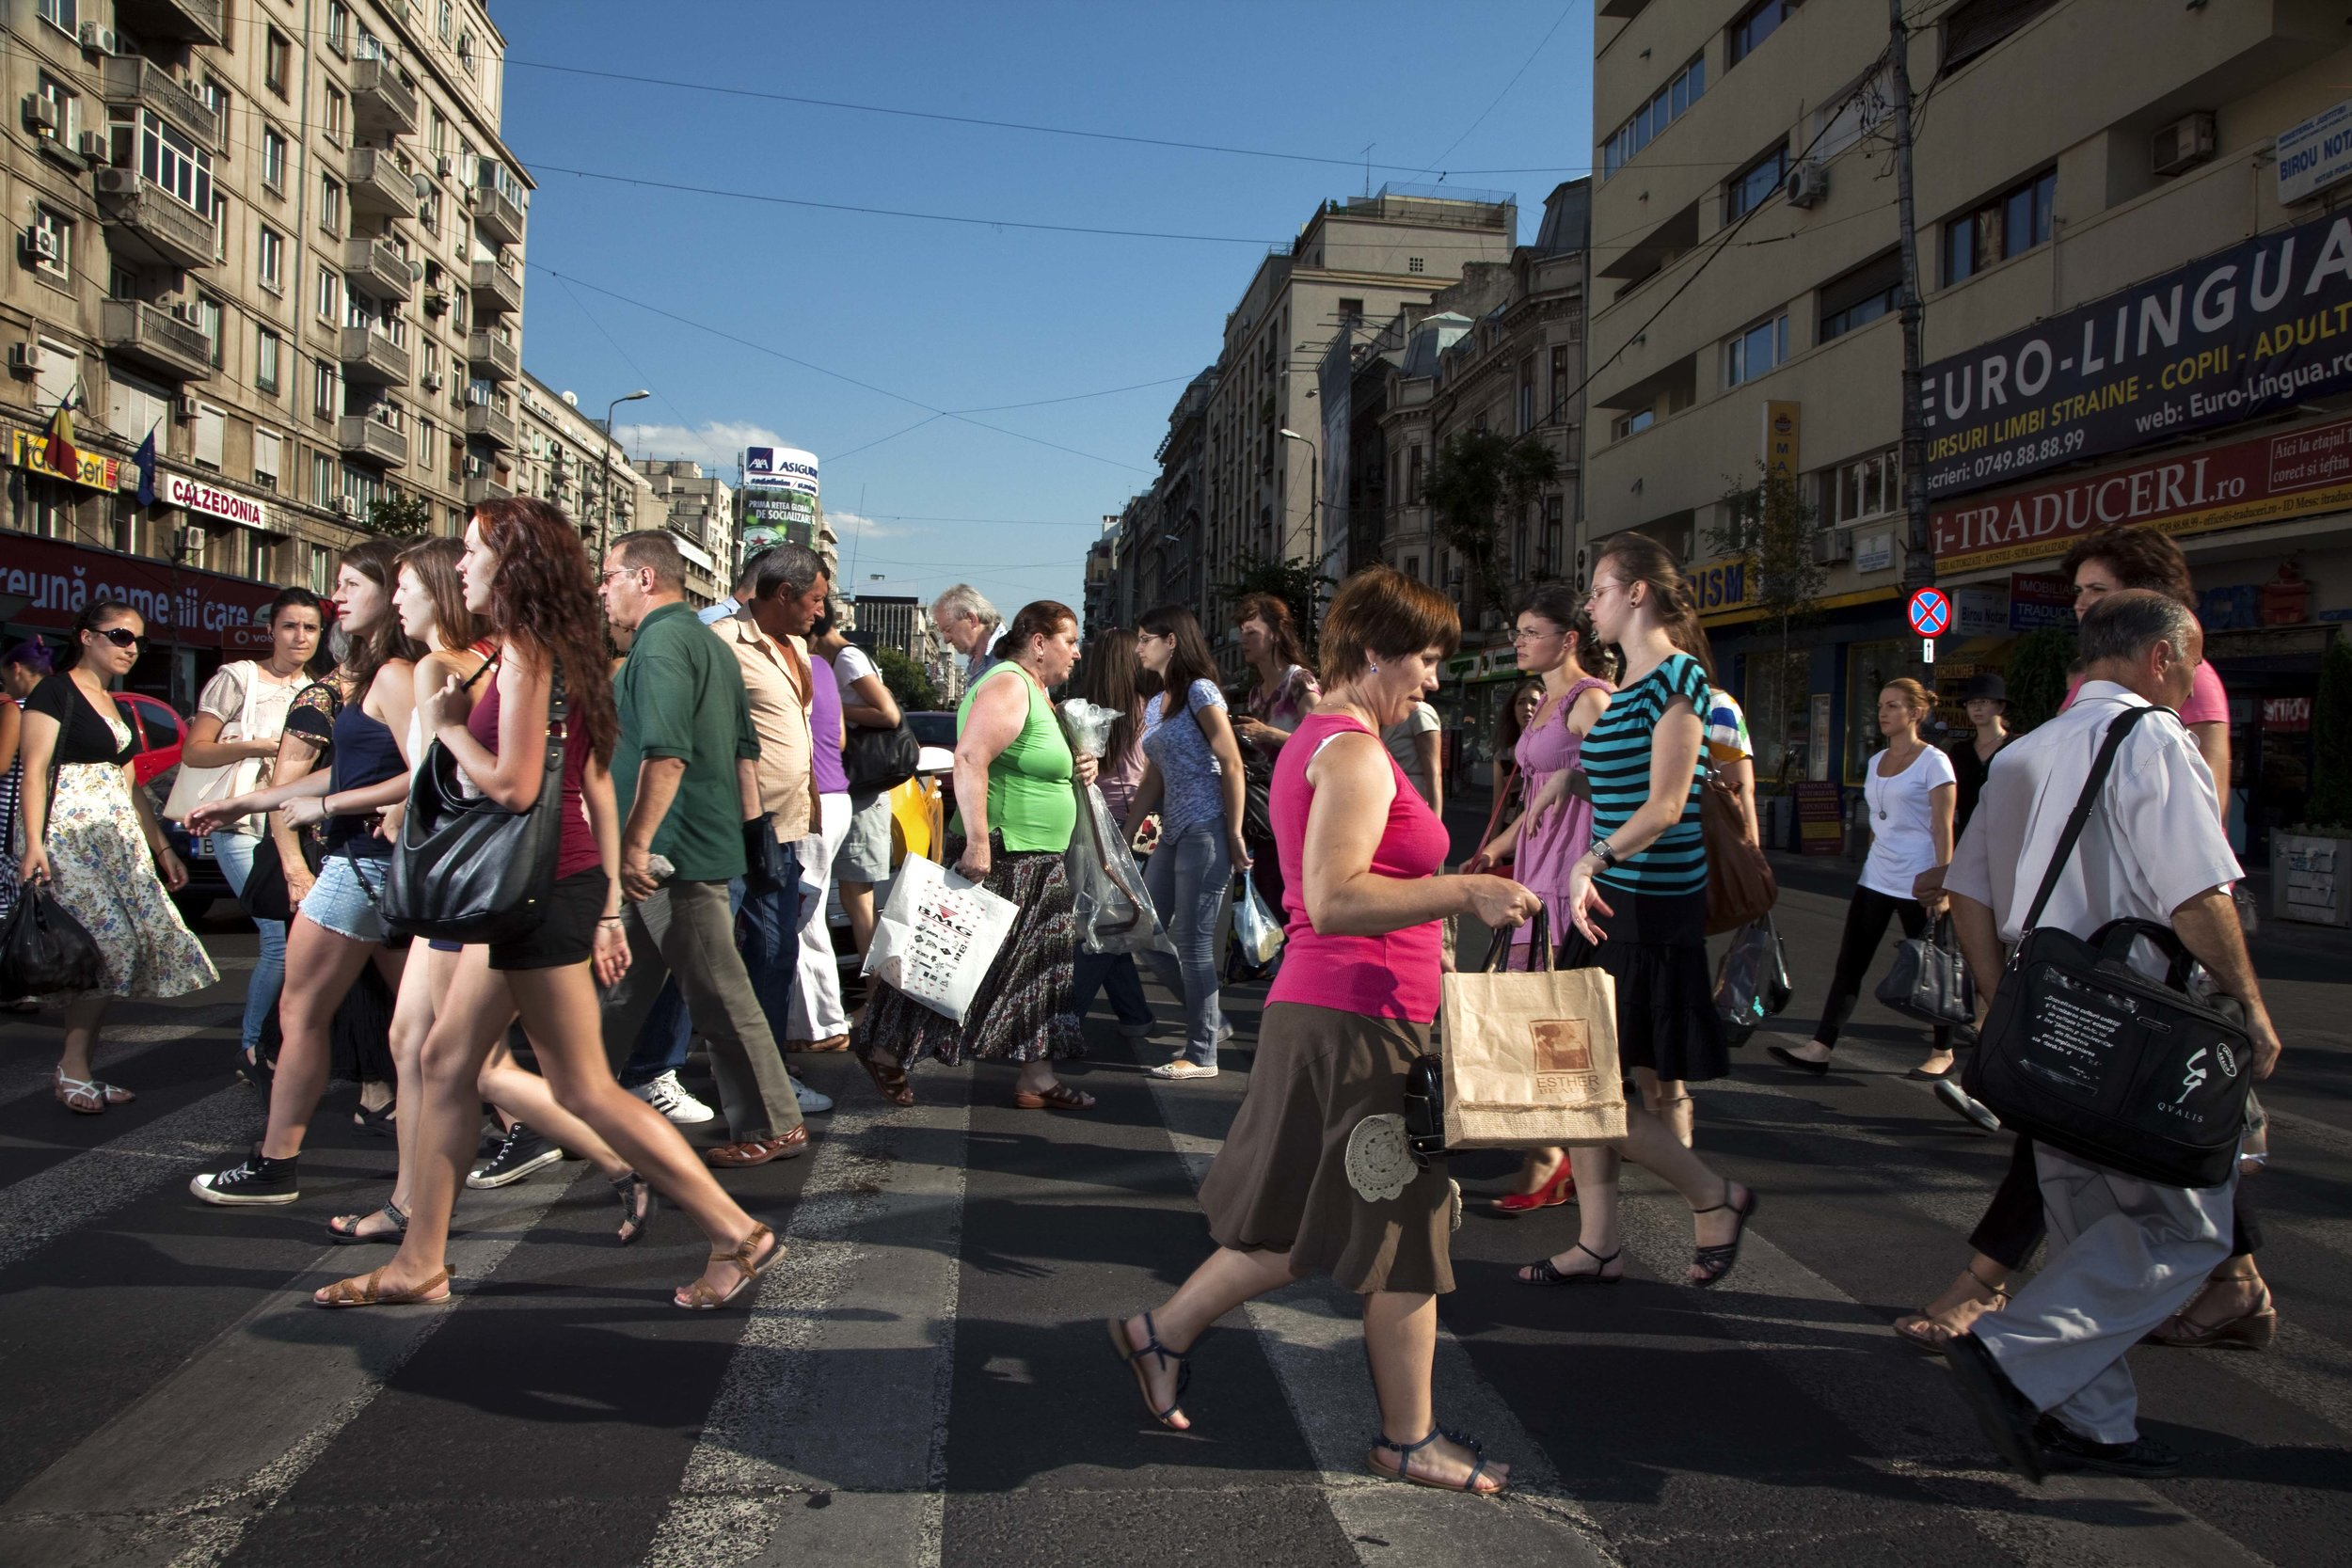 Bukarest_Romania_Crossing_Europe_Poike_Stomps_MG_9816.jpg